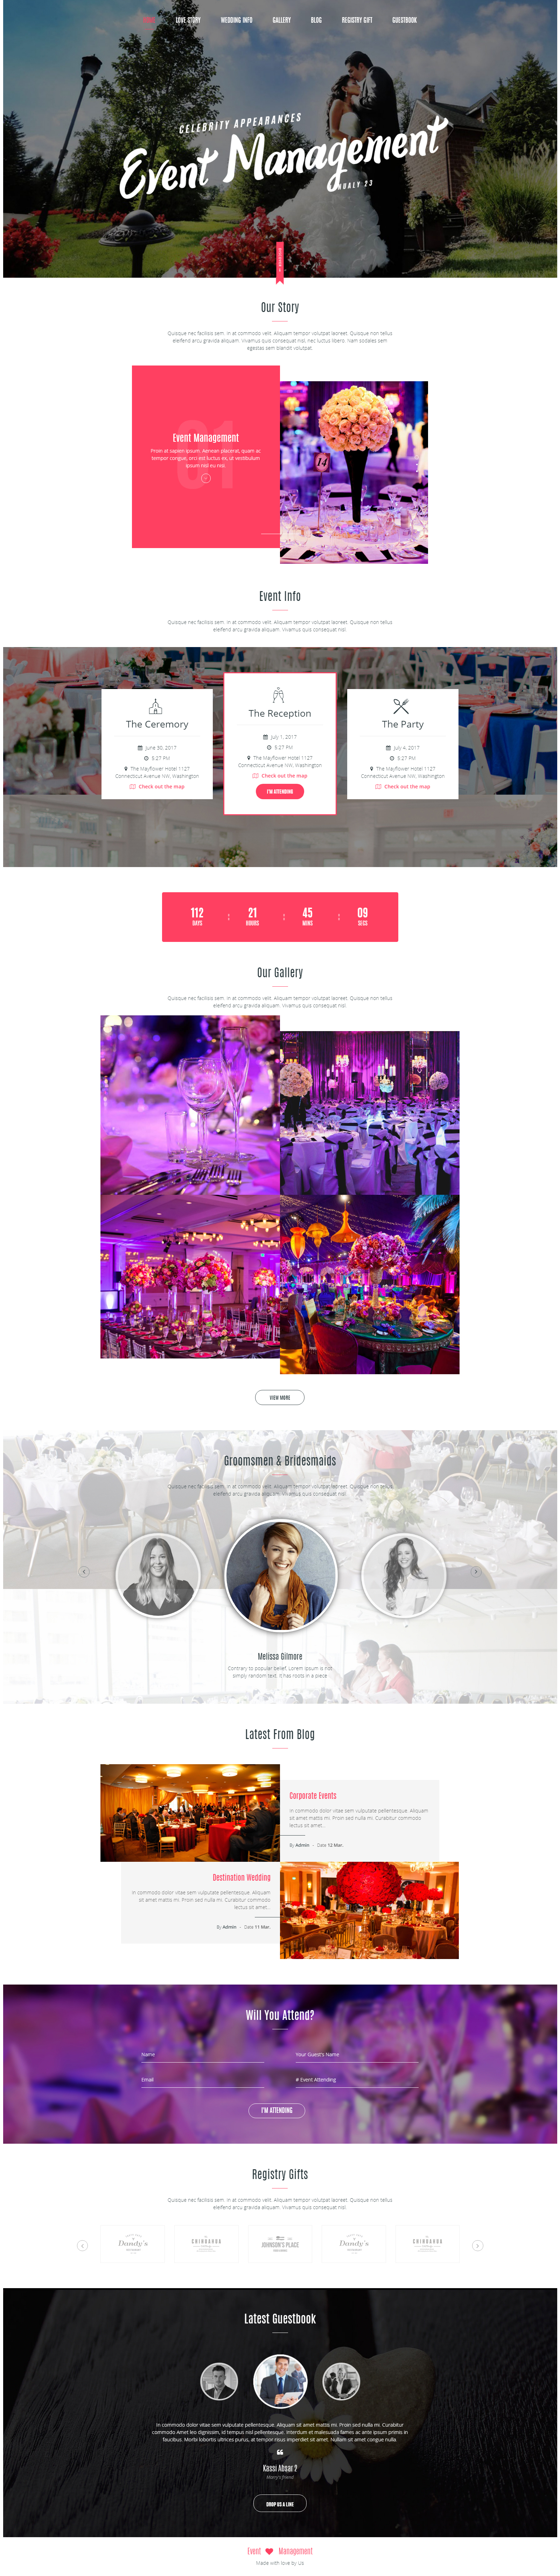 event-magenment -web design Kolkata